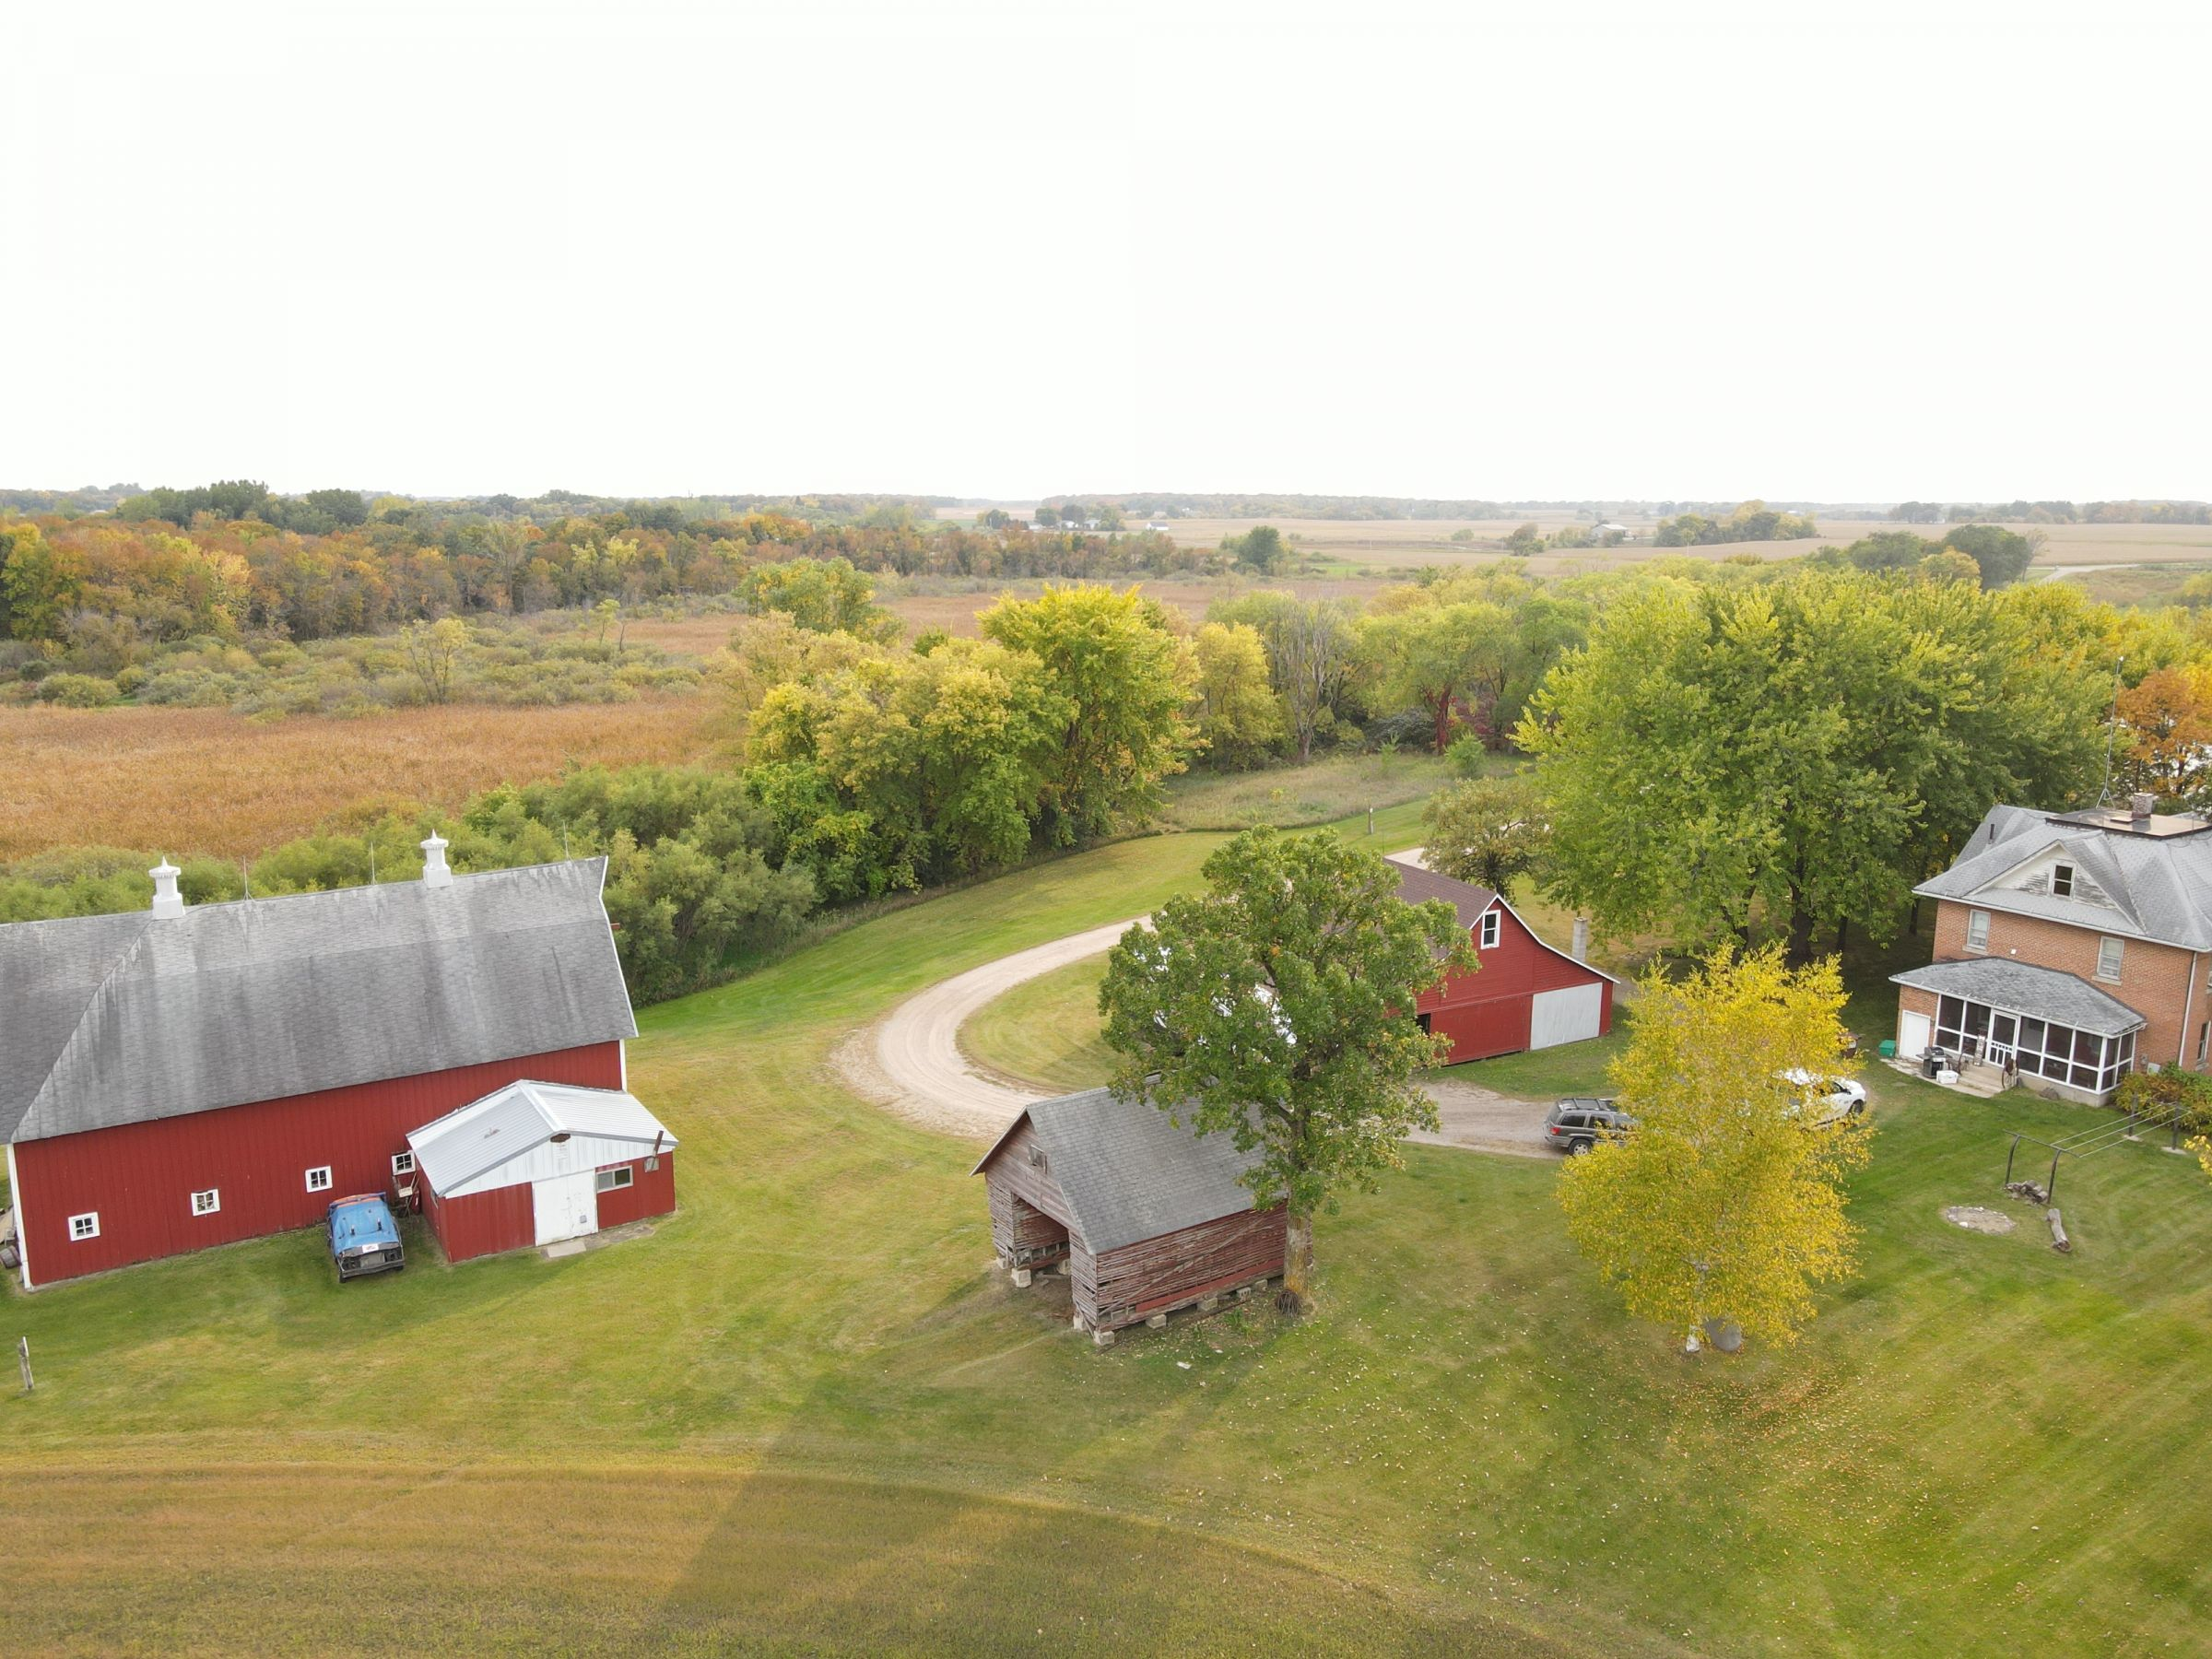 residential-land-mcleod-county-minnesota-80-acres-listing-number-15182-4-2020-10-07-142943.JPG